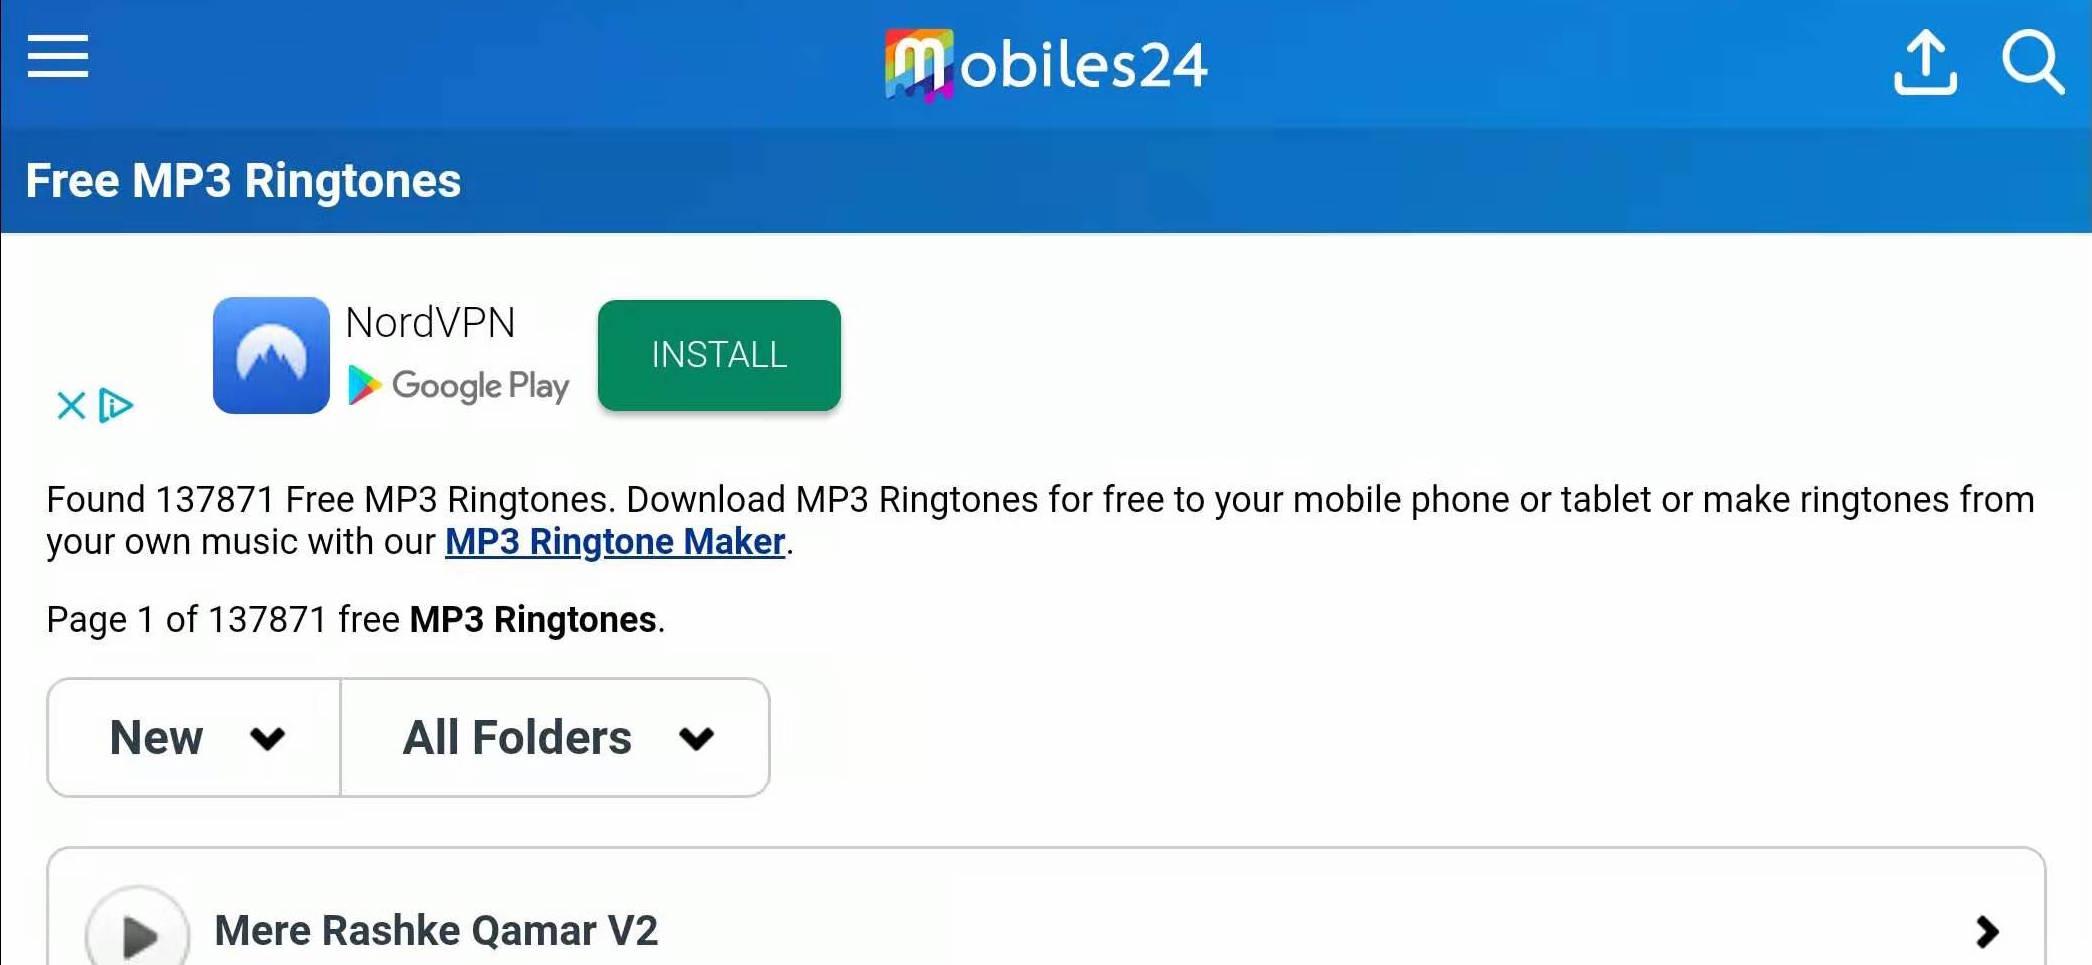 Mobiles24